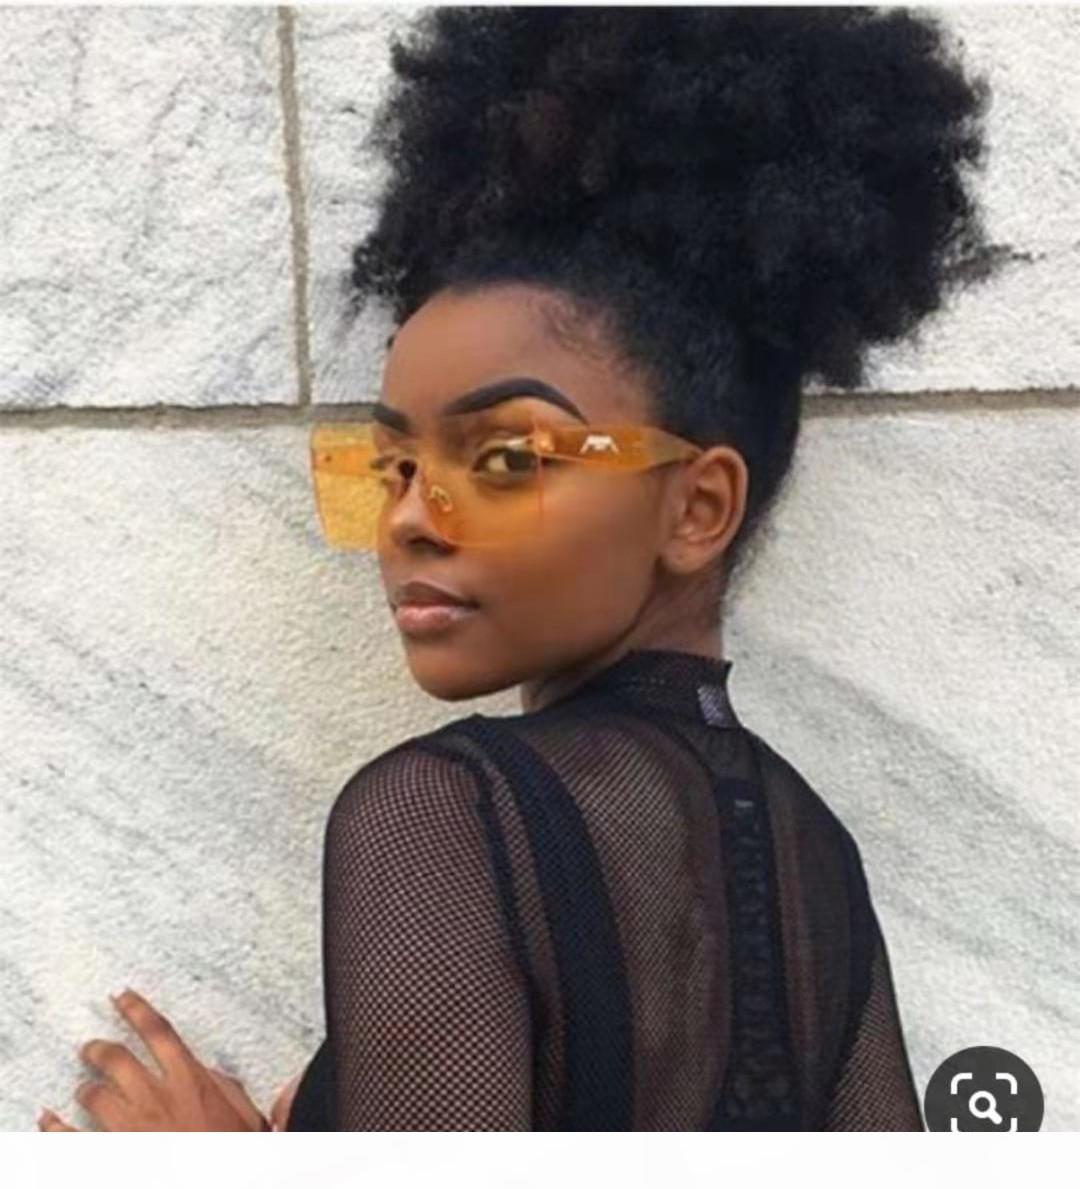 3B 4C Afro Kinky Curly Curly Extensão de Cabelo Virgin para Mulheres Negras 140g 120g Natural Cabelo Puff Cabelo Humano Weave rabo de cavalo